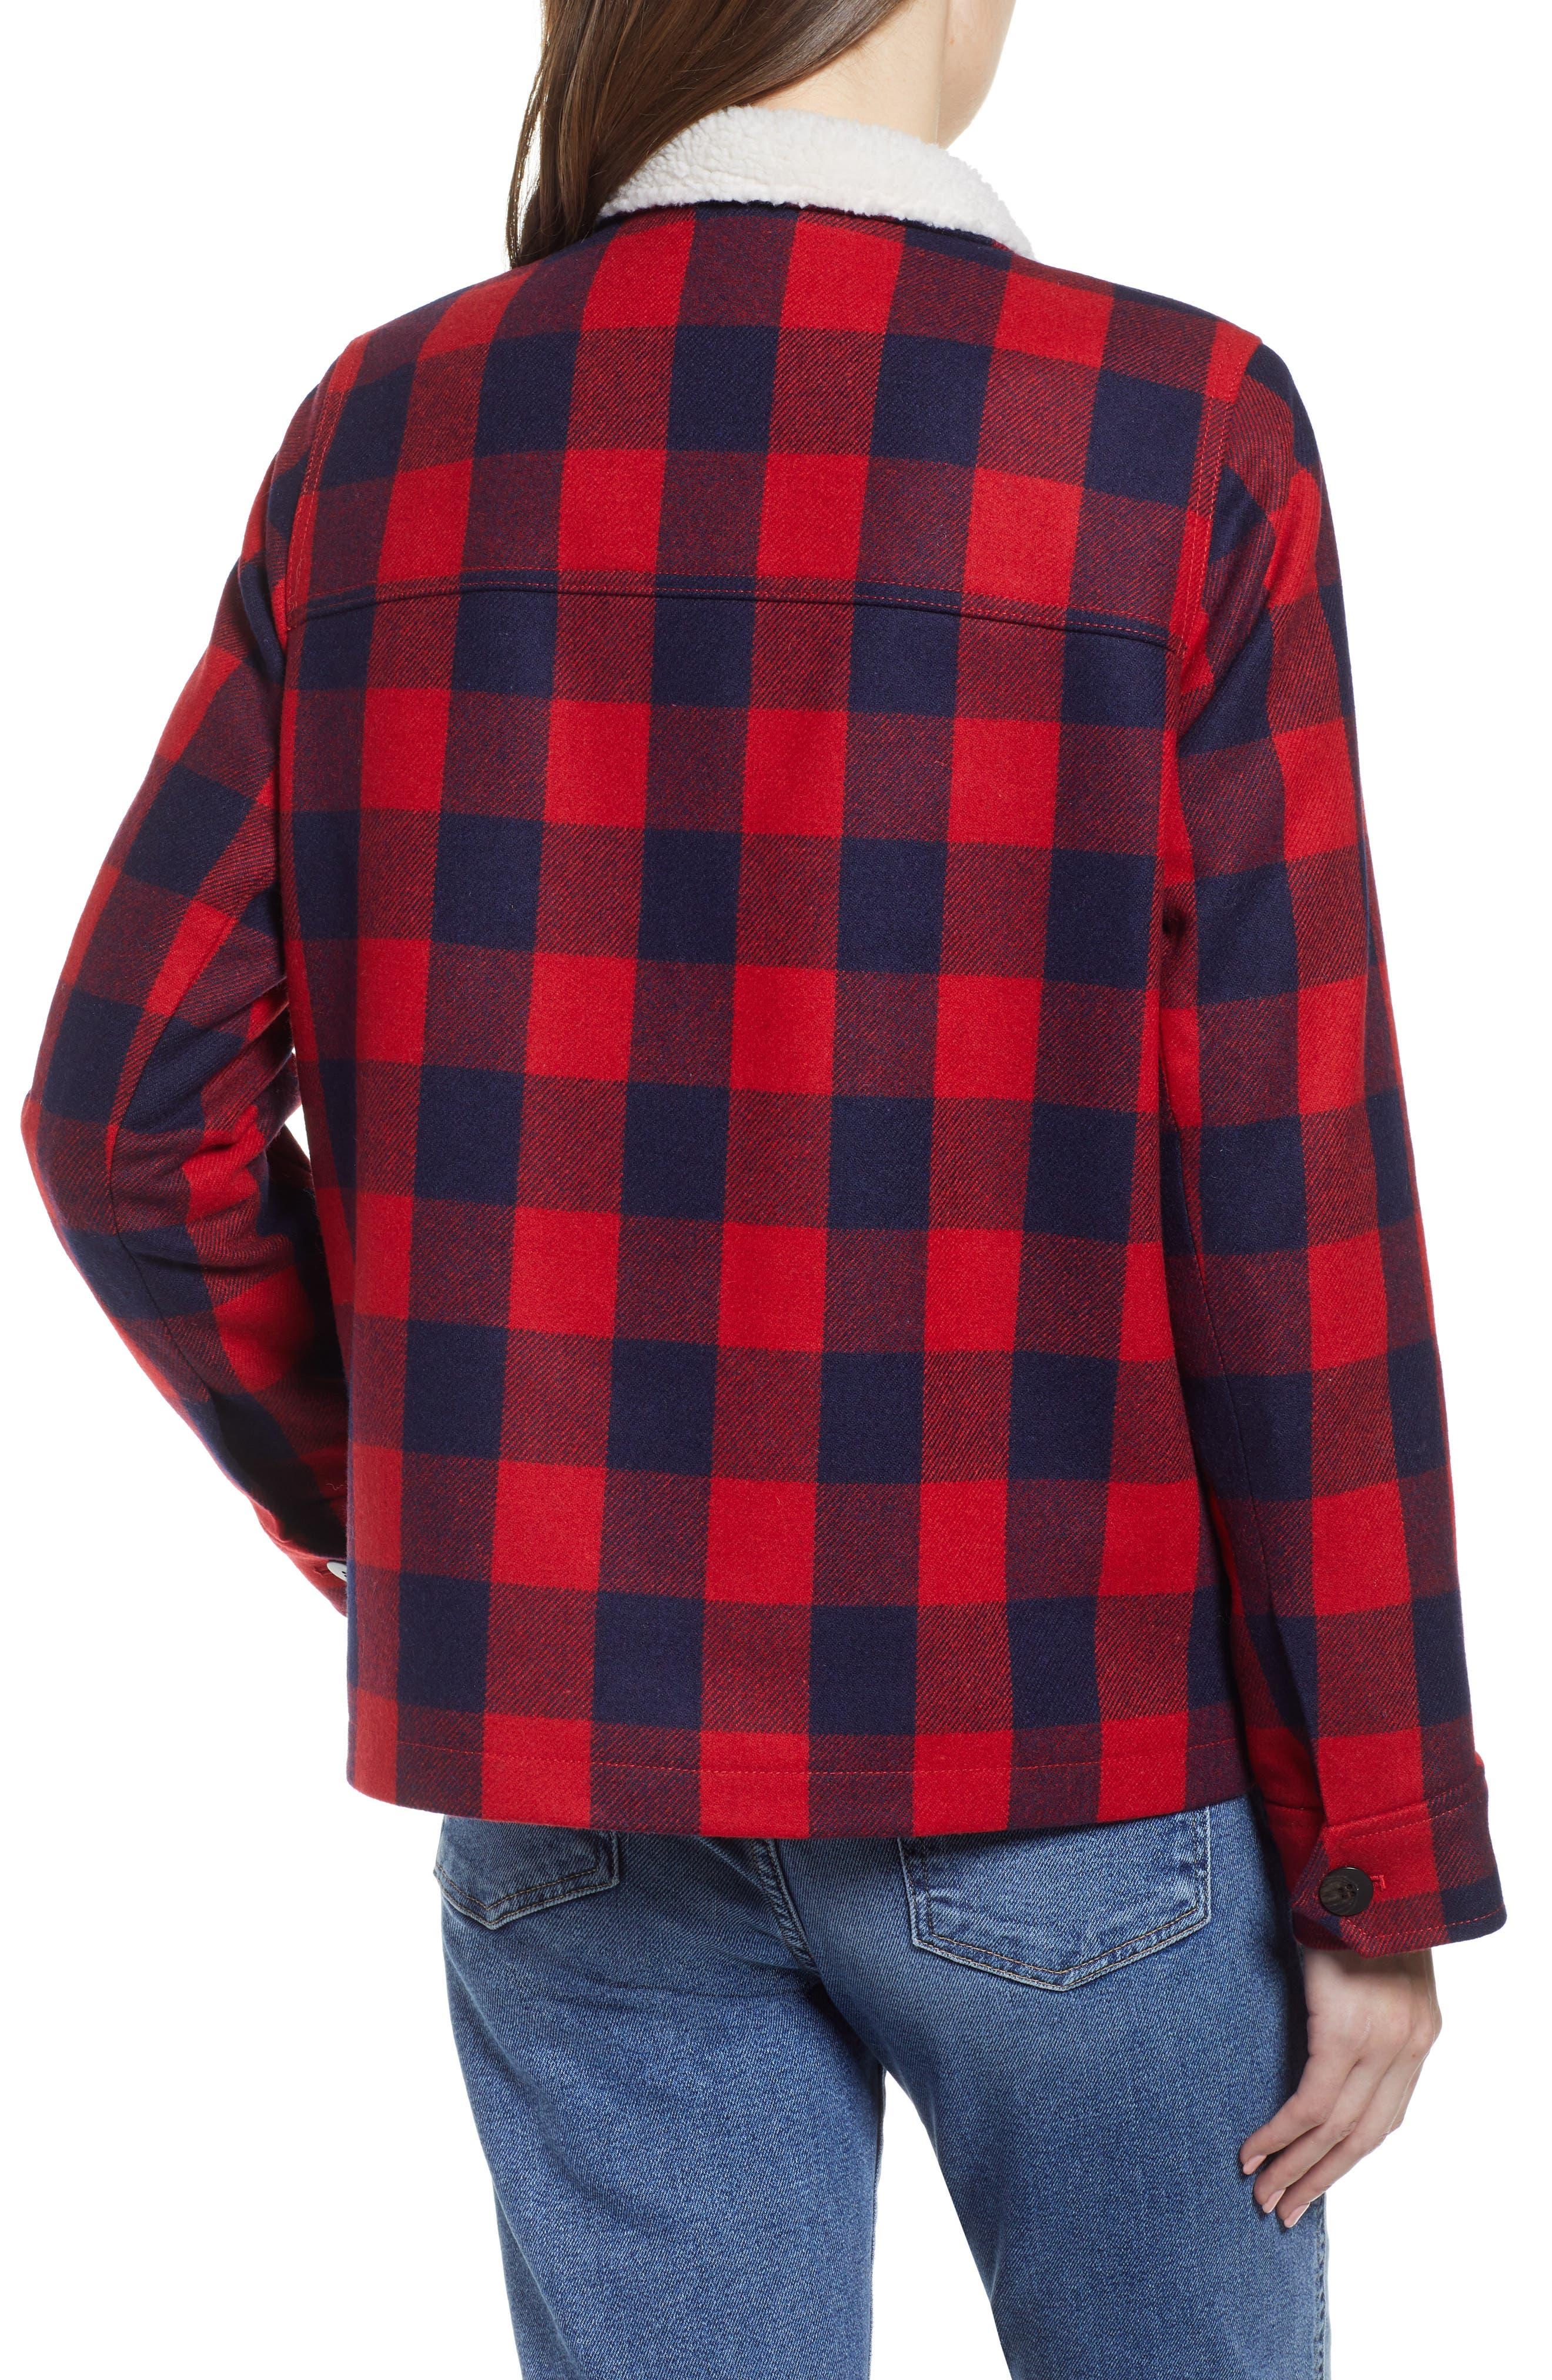 Buffalo Check Workwear Jacket with Faux Shearling Lining,                             Alternate thumbnail 2, color,                             RED NAVY BUFFALO